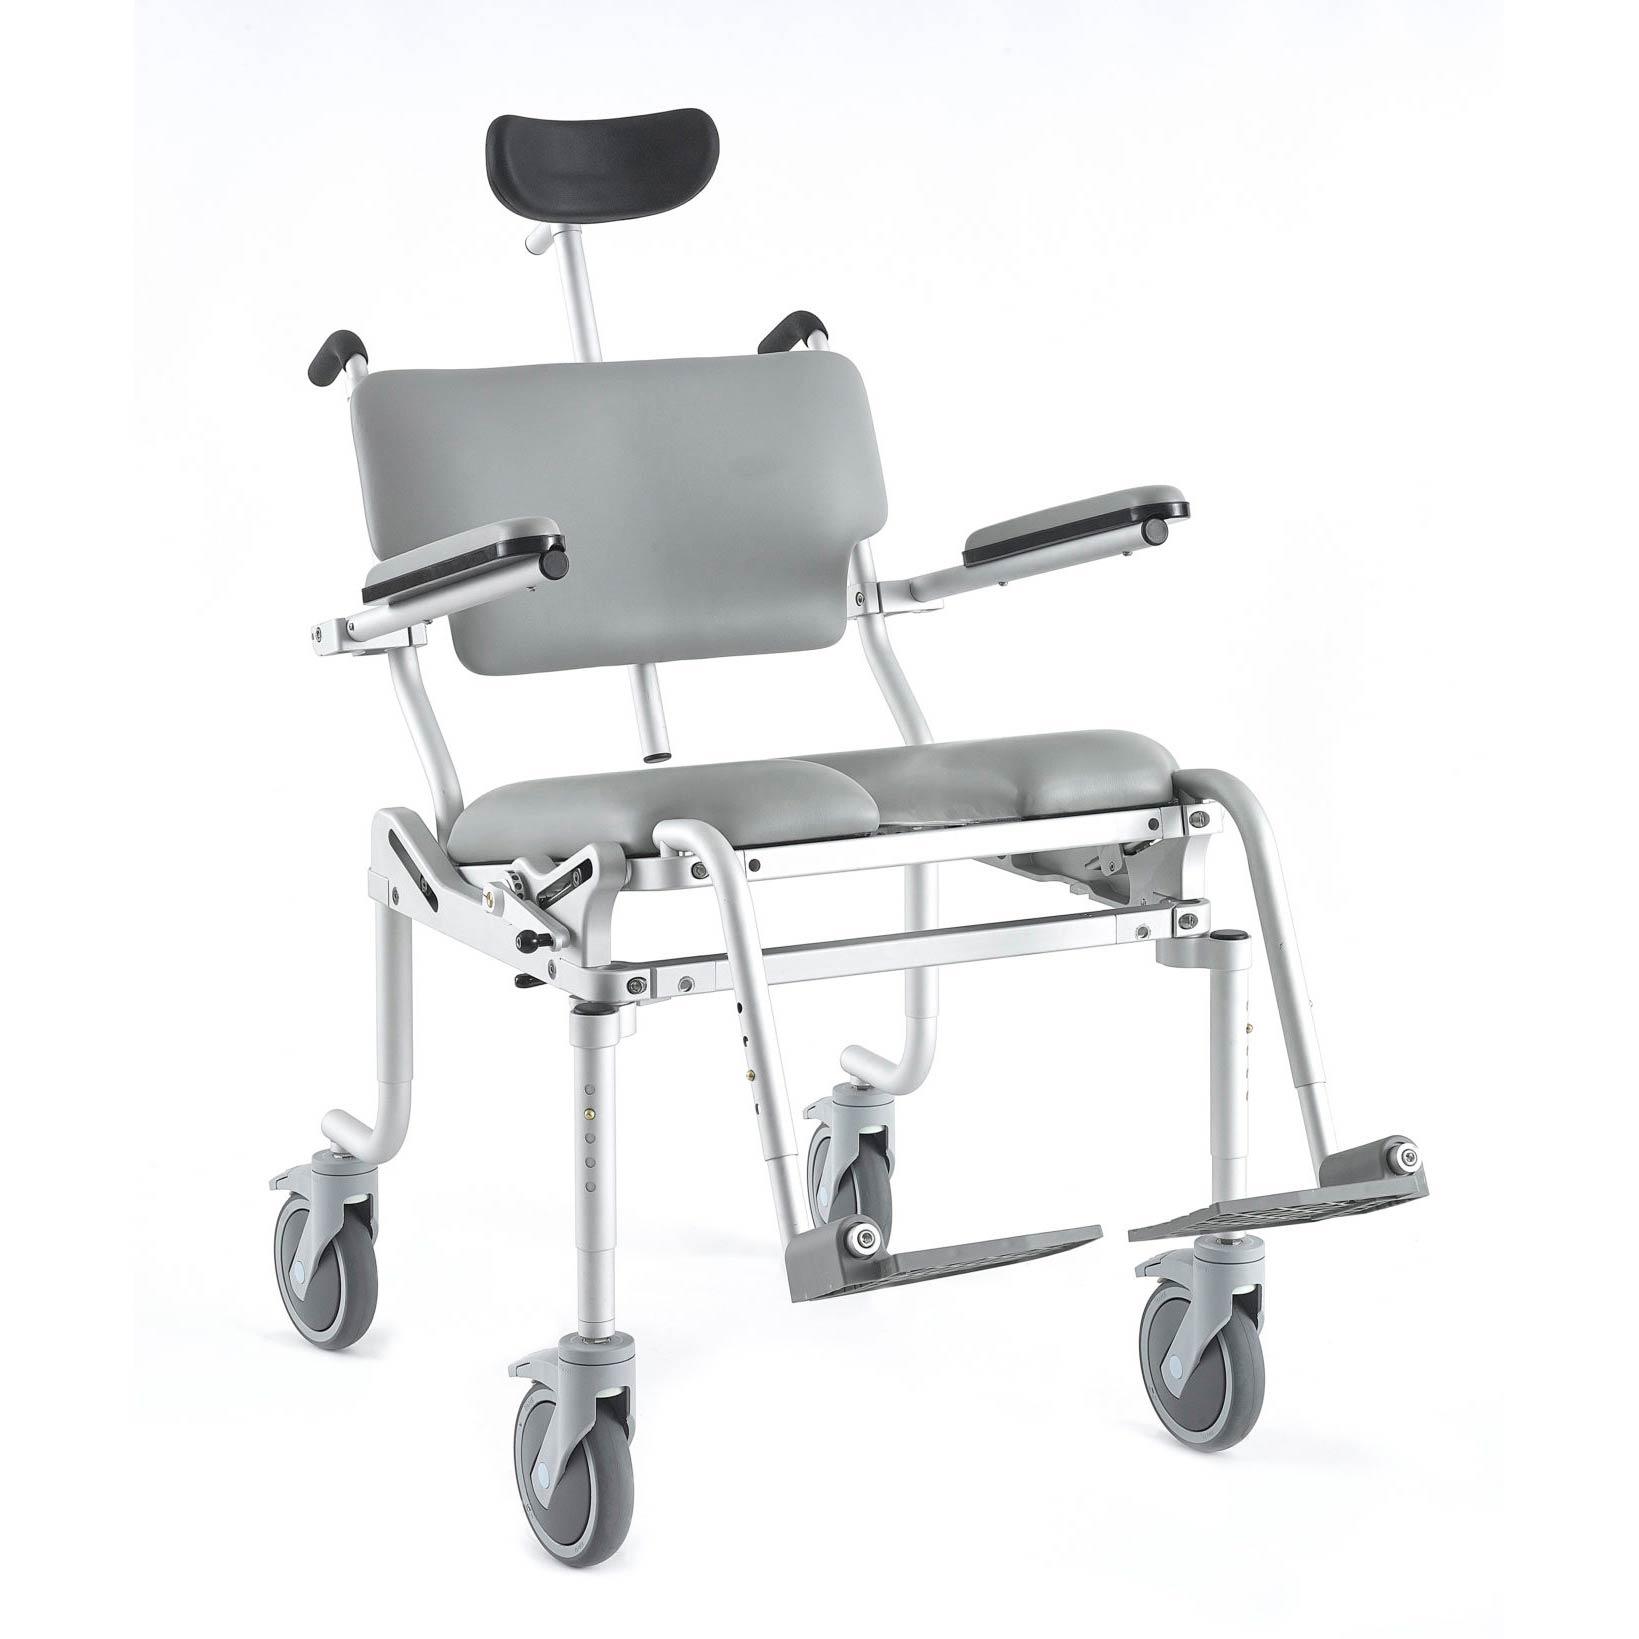 Nuprodx Multichair 4200 Tilt Roll In Shower Commode Chair